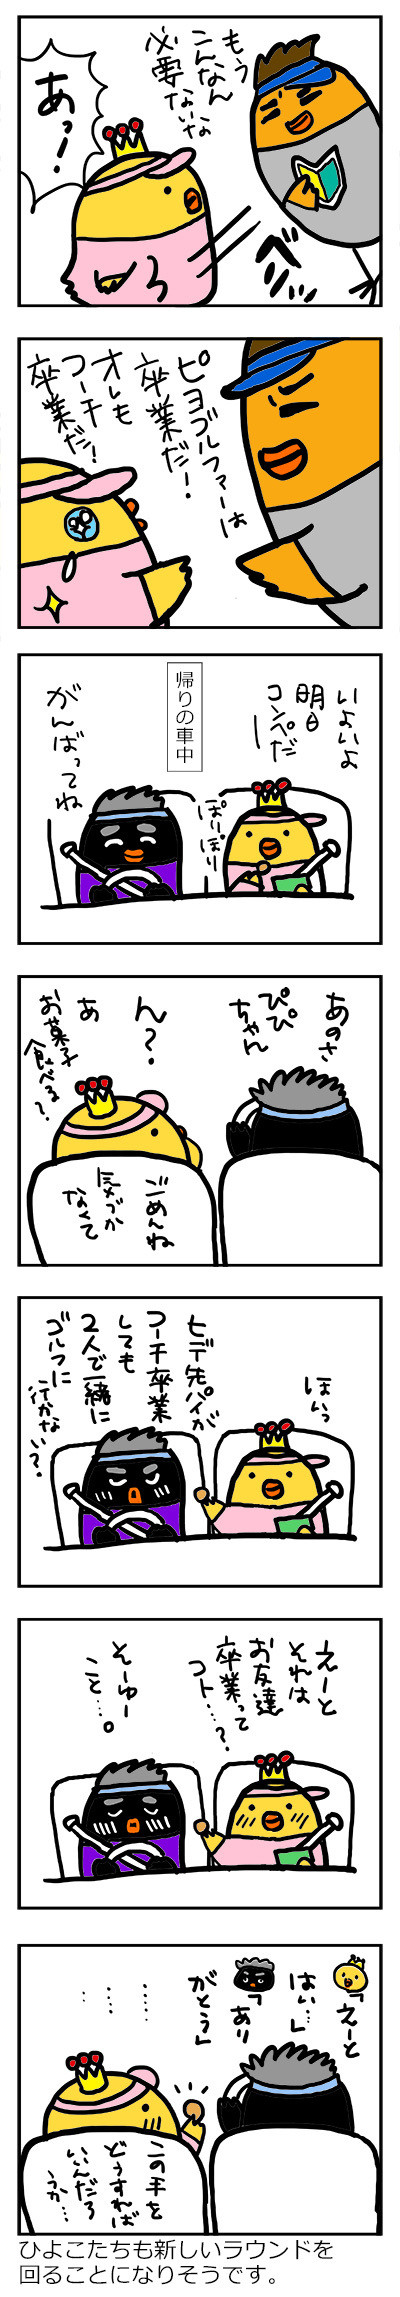 150220golf21-2.jpg